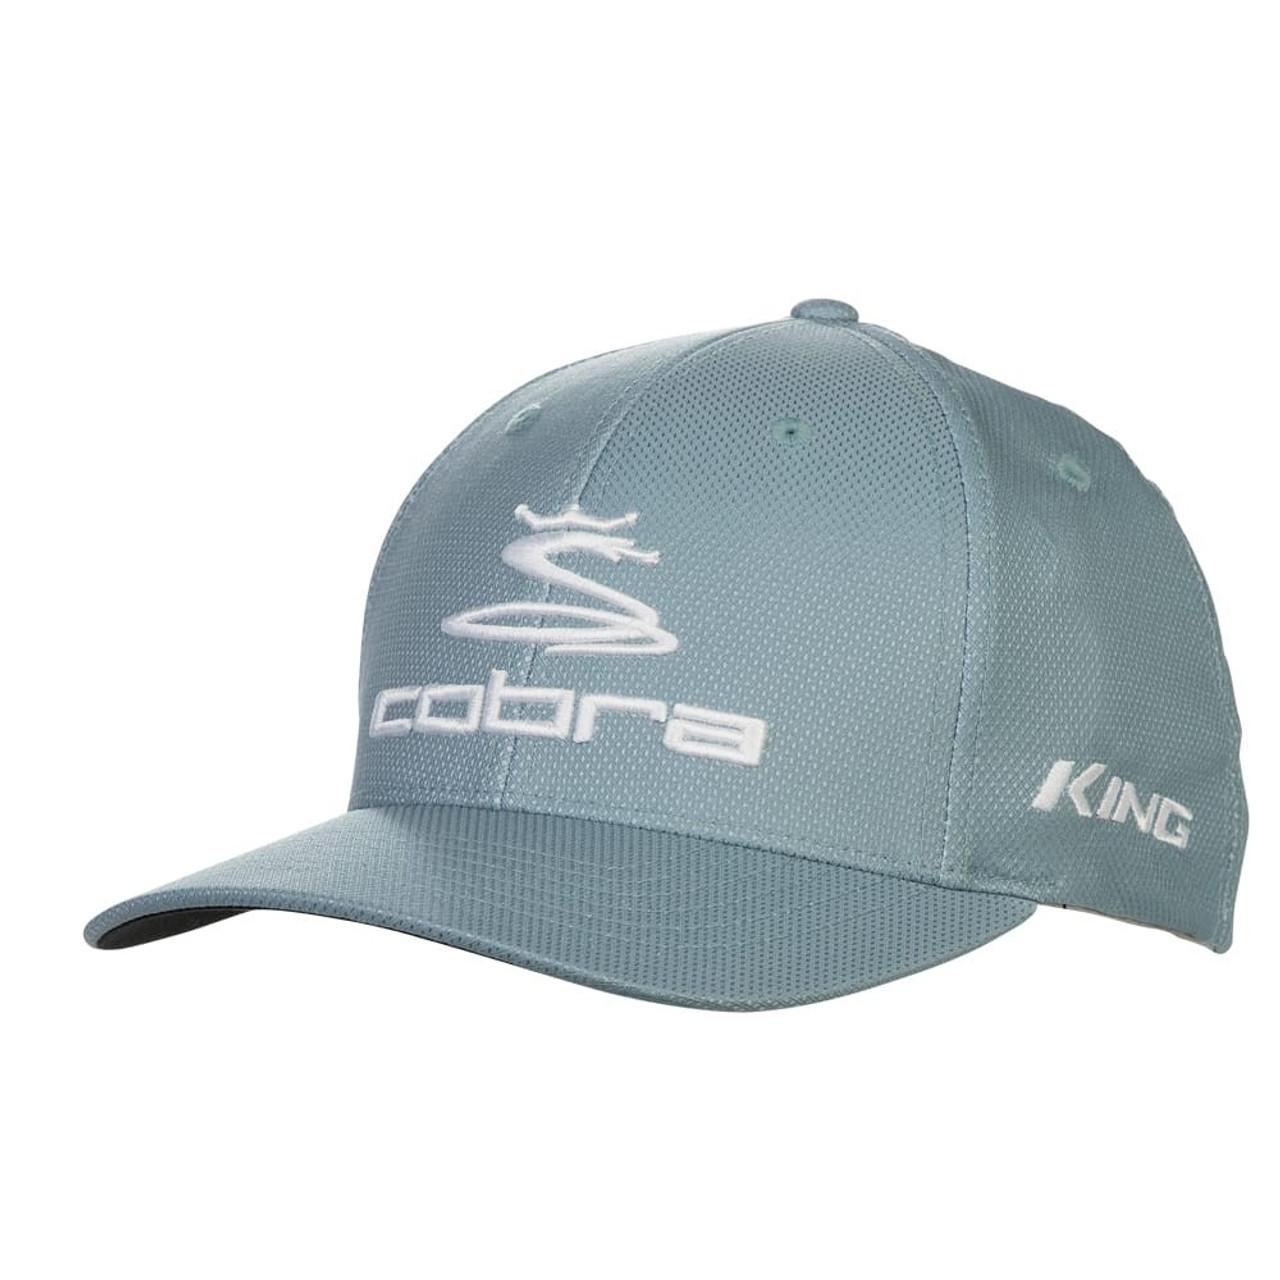 Cobra Pro Tour Stretch Fit Cap- Quarry